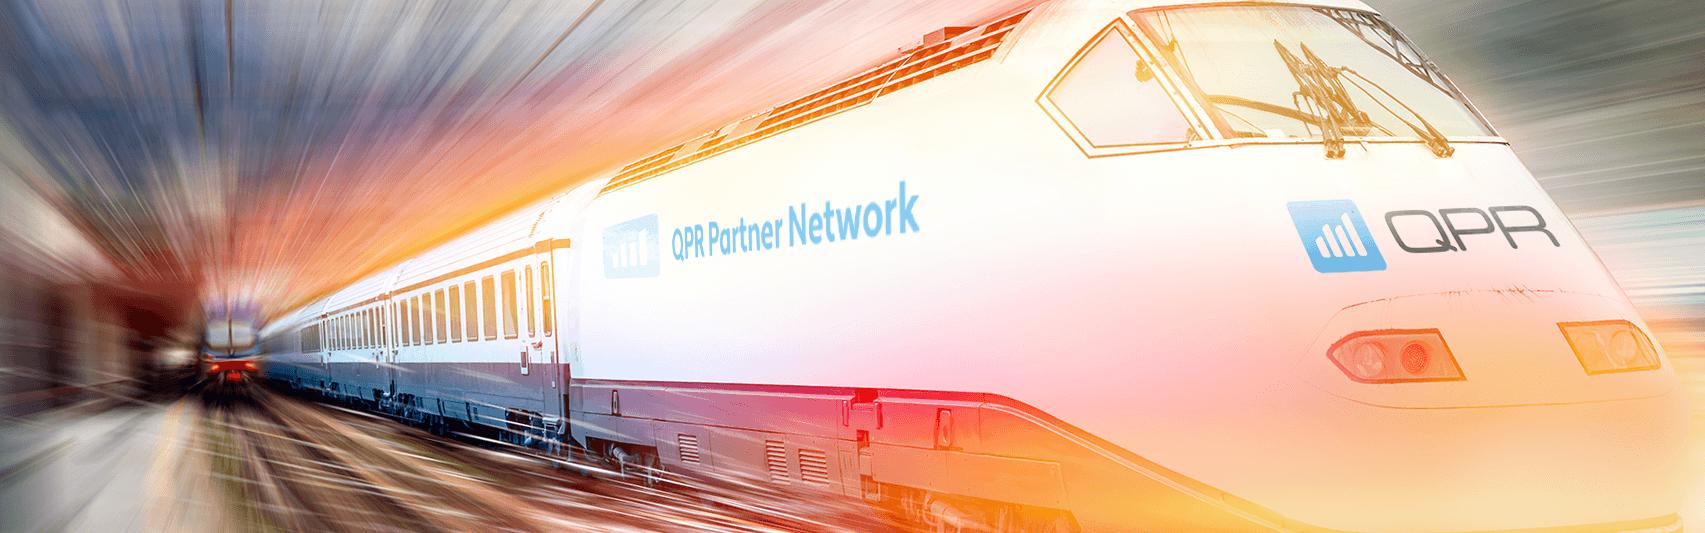 qpr-banner-partner-1